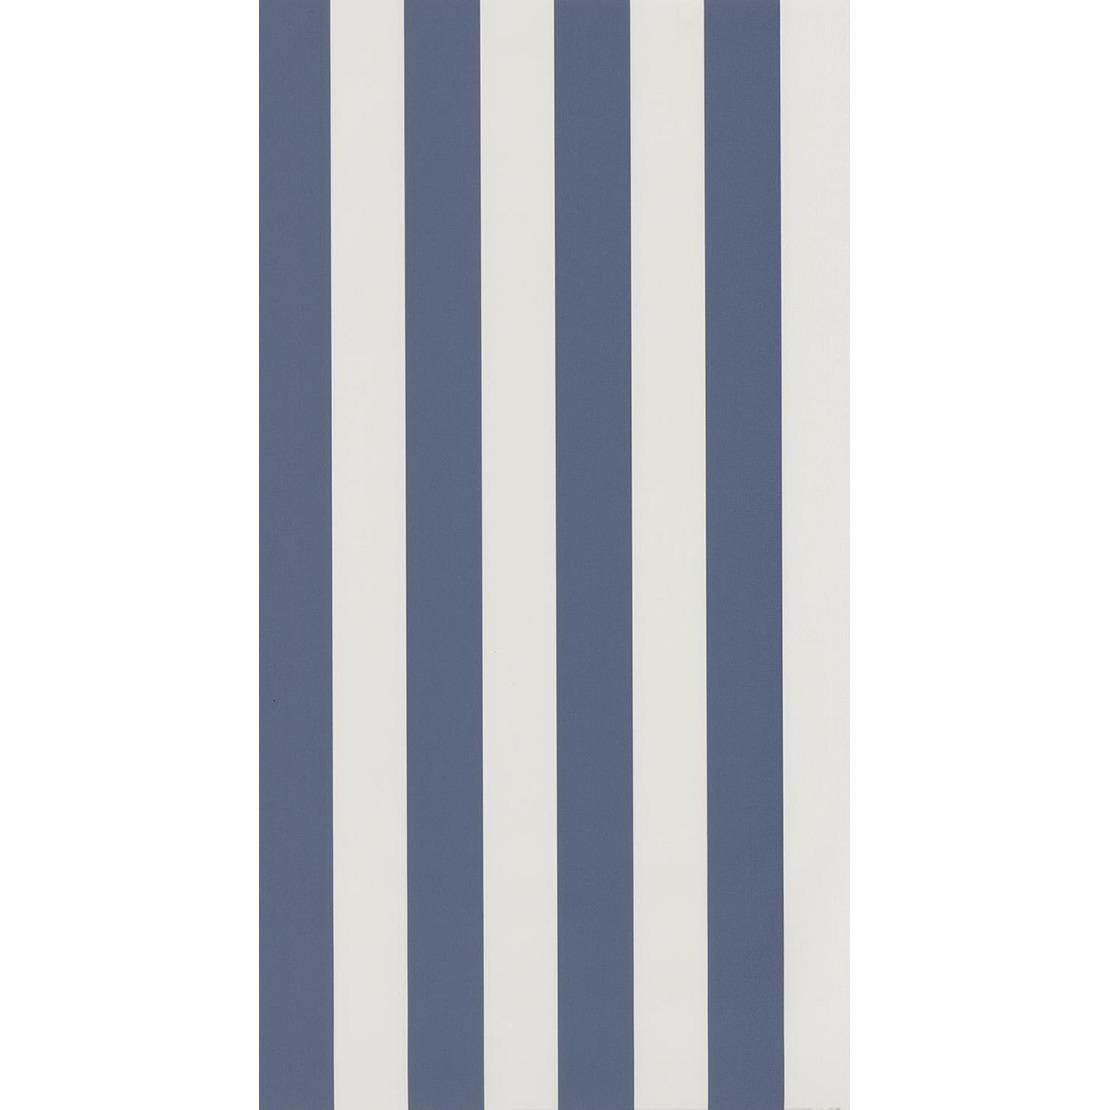 Французские обои Casadeco,  коллекция Baltic, артикулBTI29256520